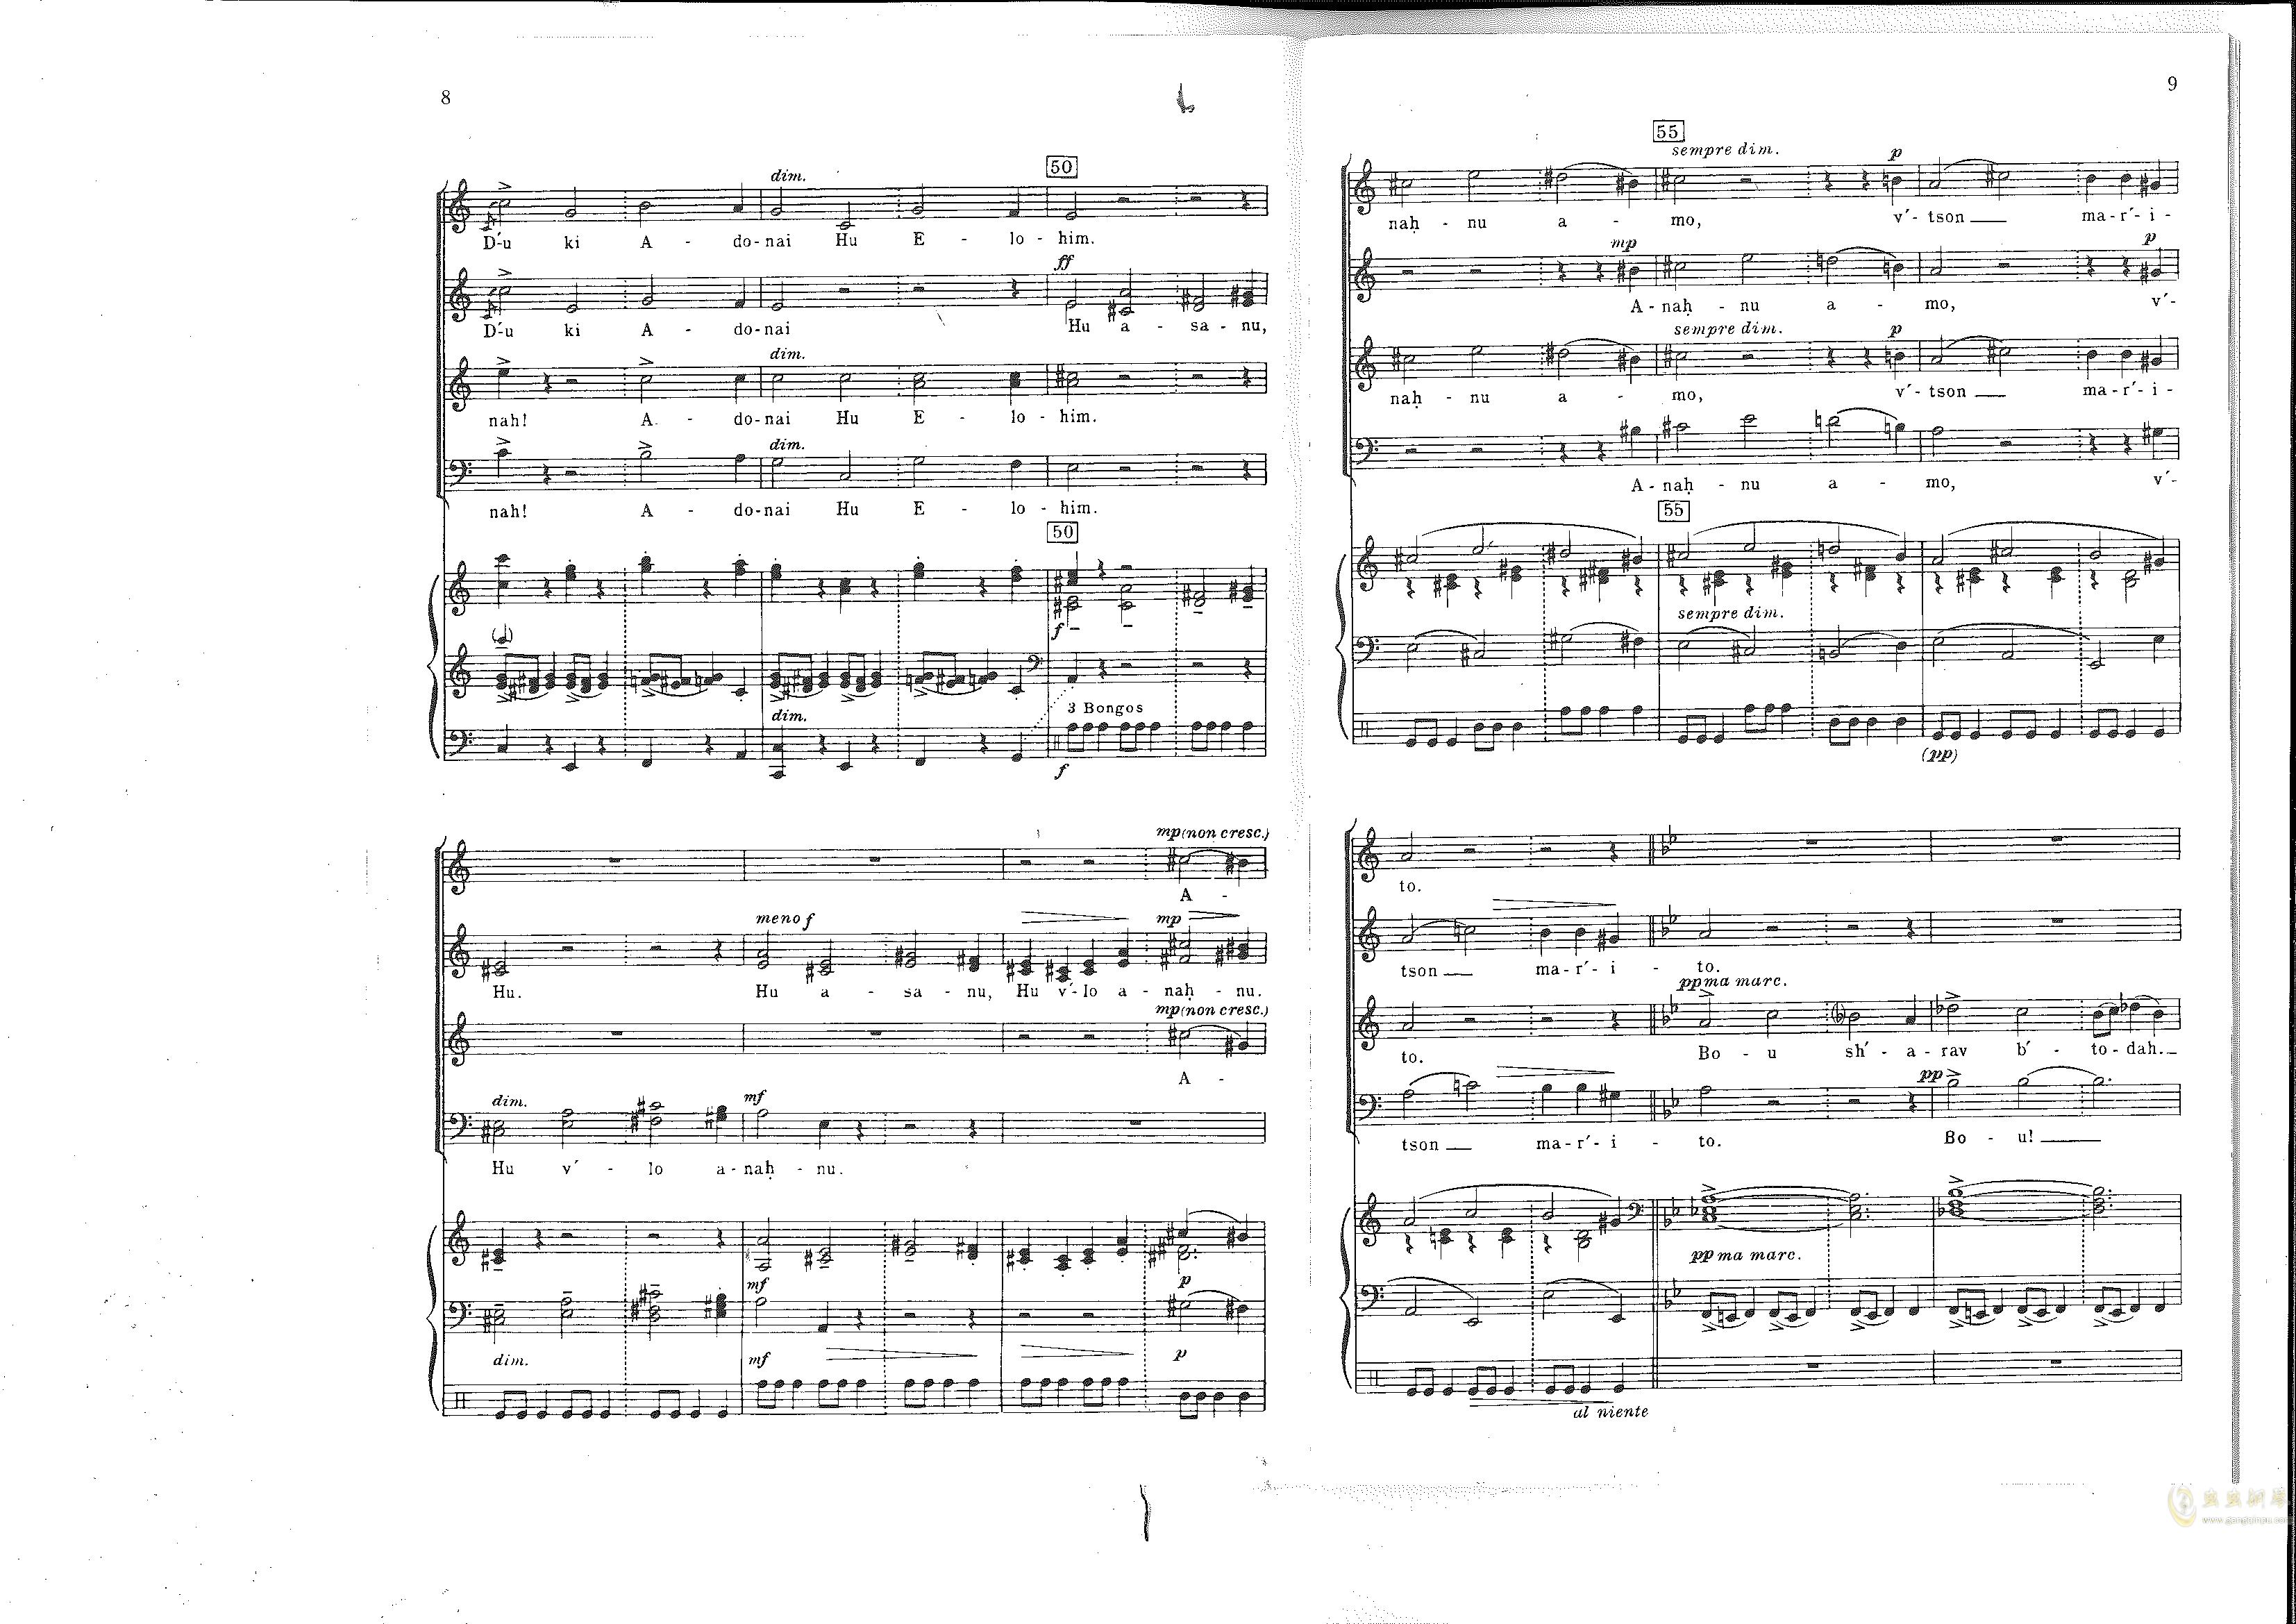 Chichester Psalms澳门星际官网 第8页